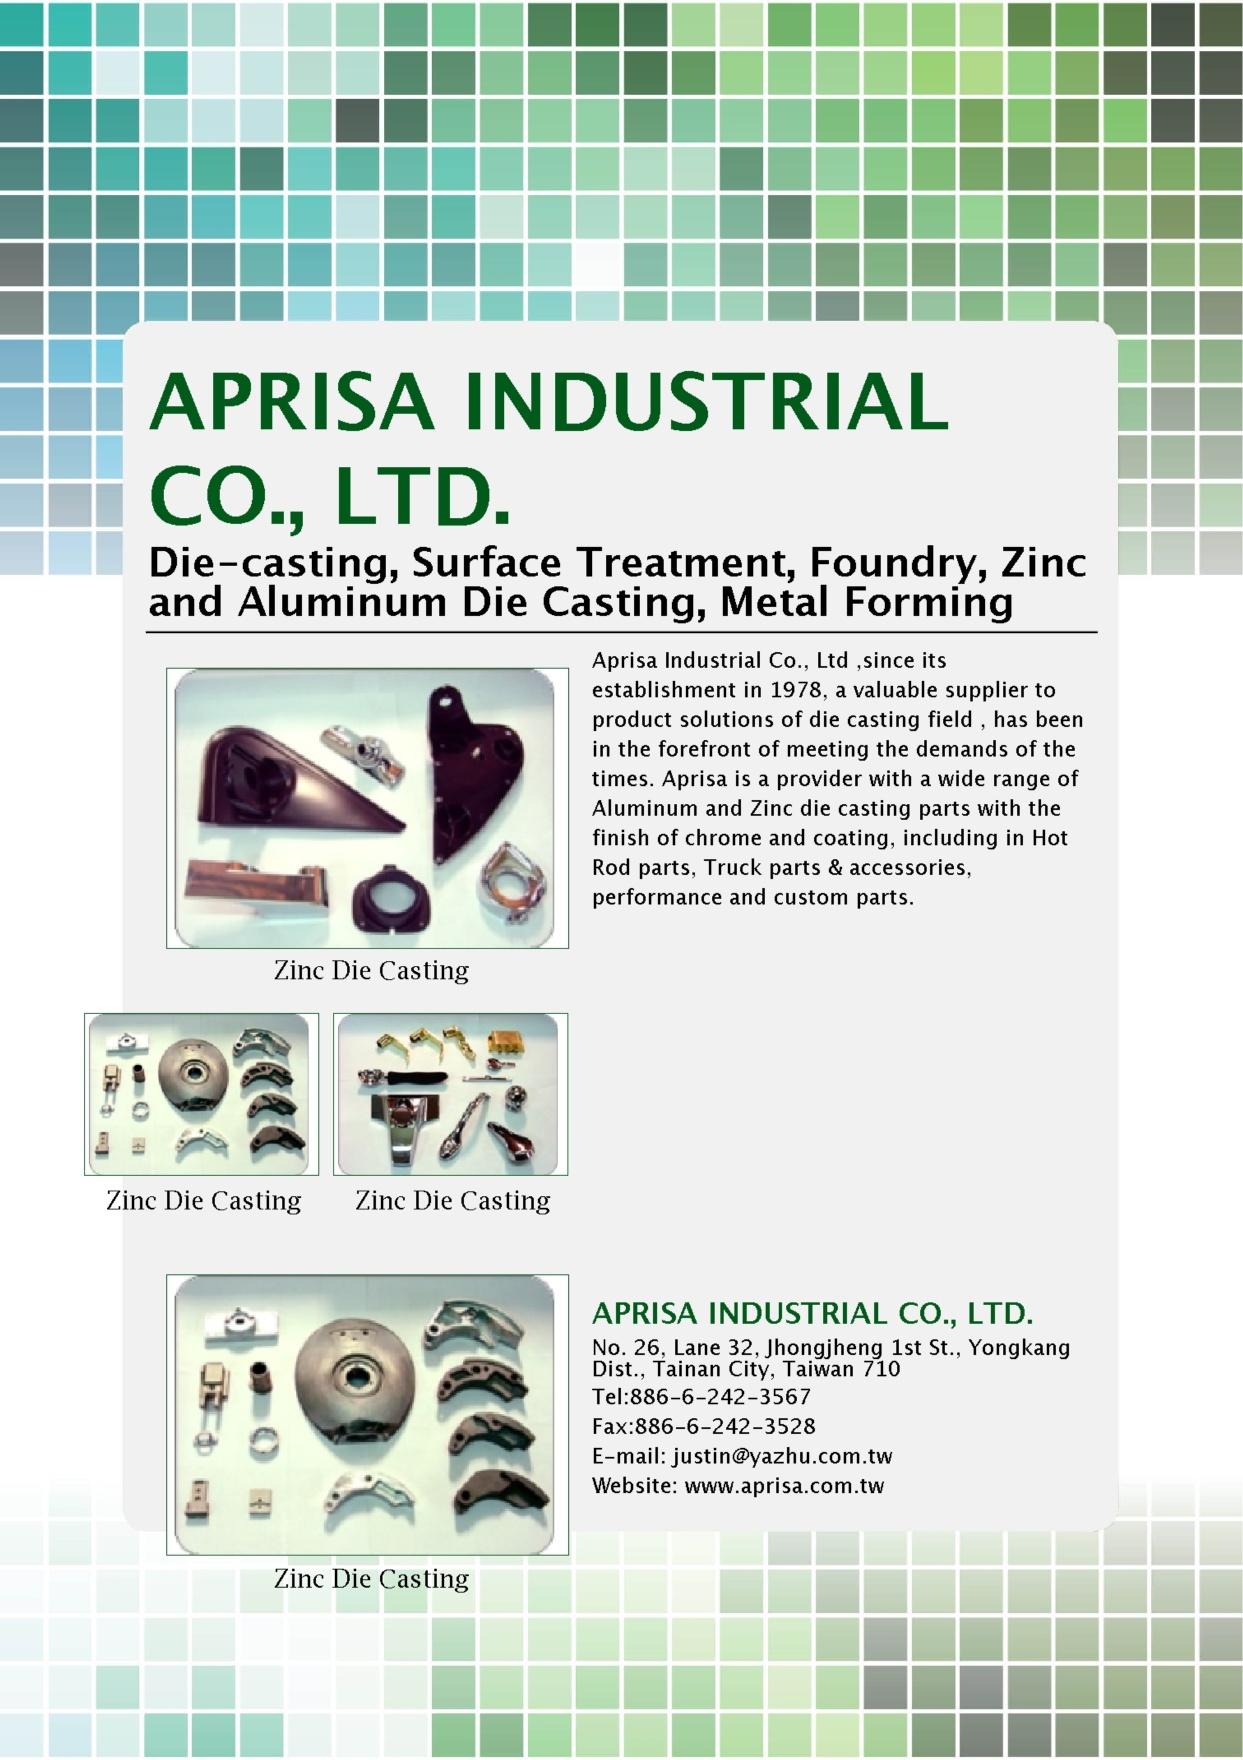 APRISA INDUSTRIAL CO., LTD.